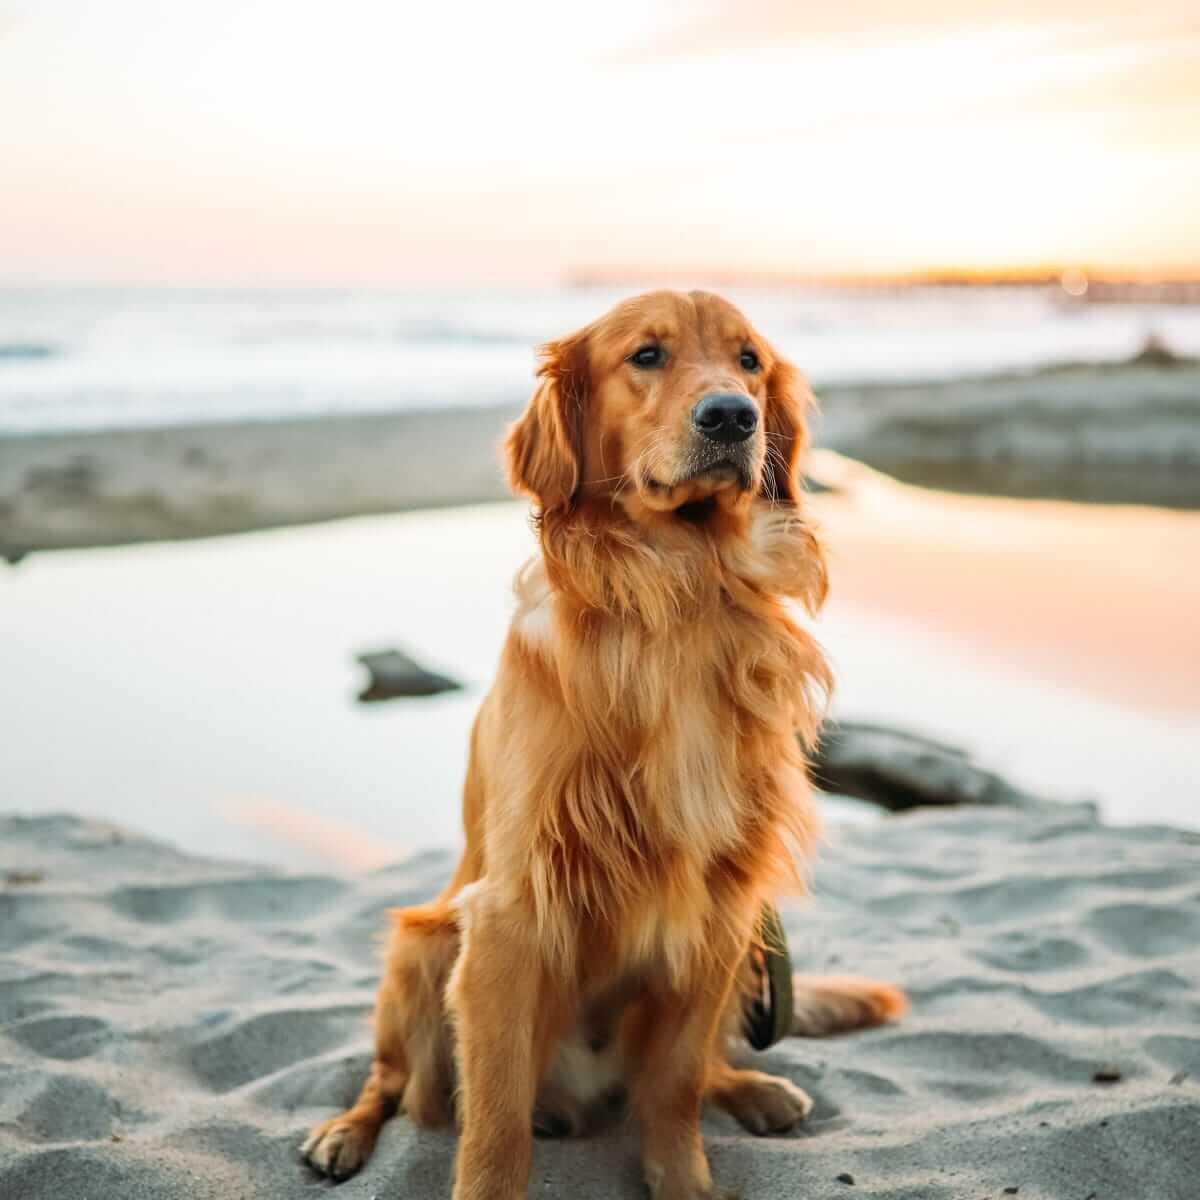 Anjing Golden : Karakter, Variasi Jenis, kelebihan & Harga (Update) 3